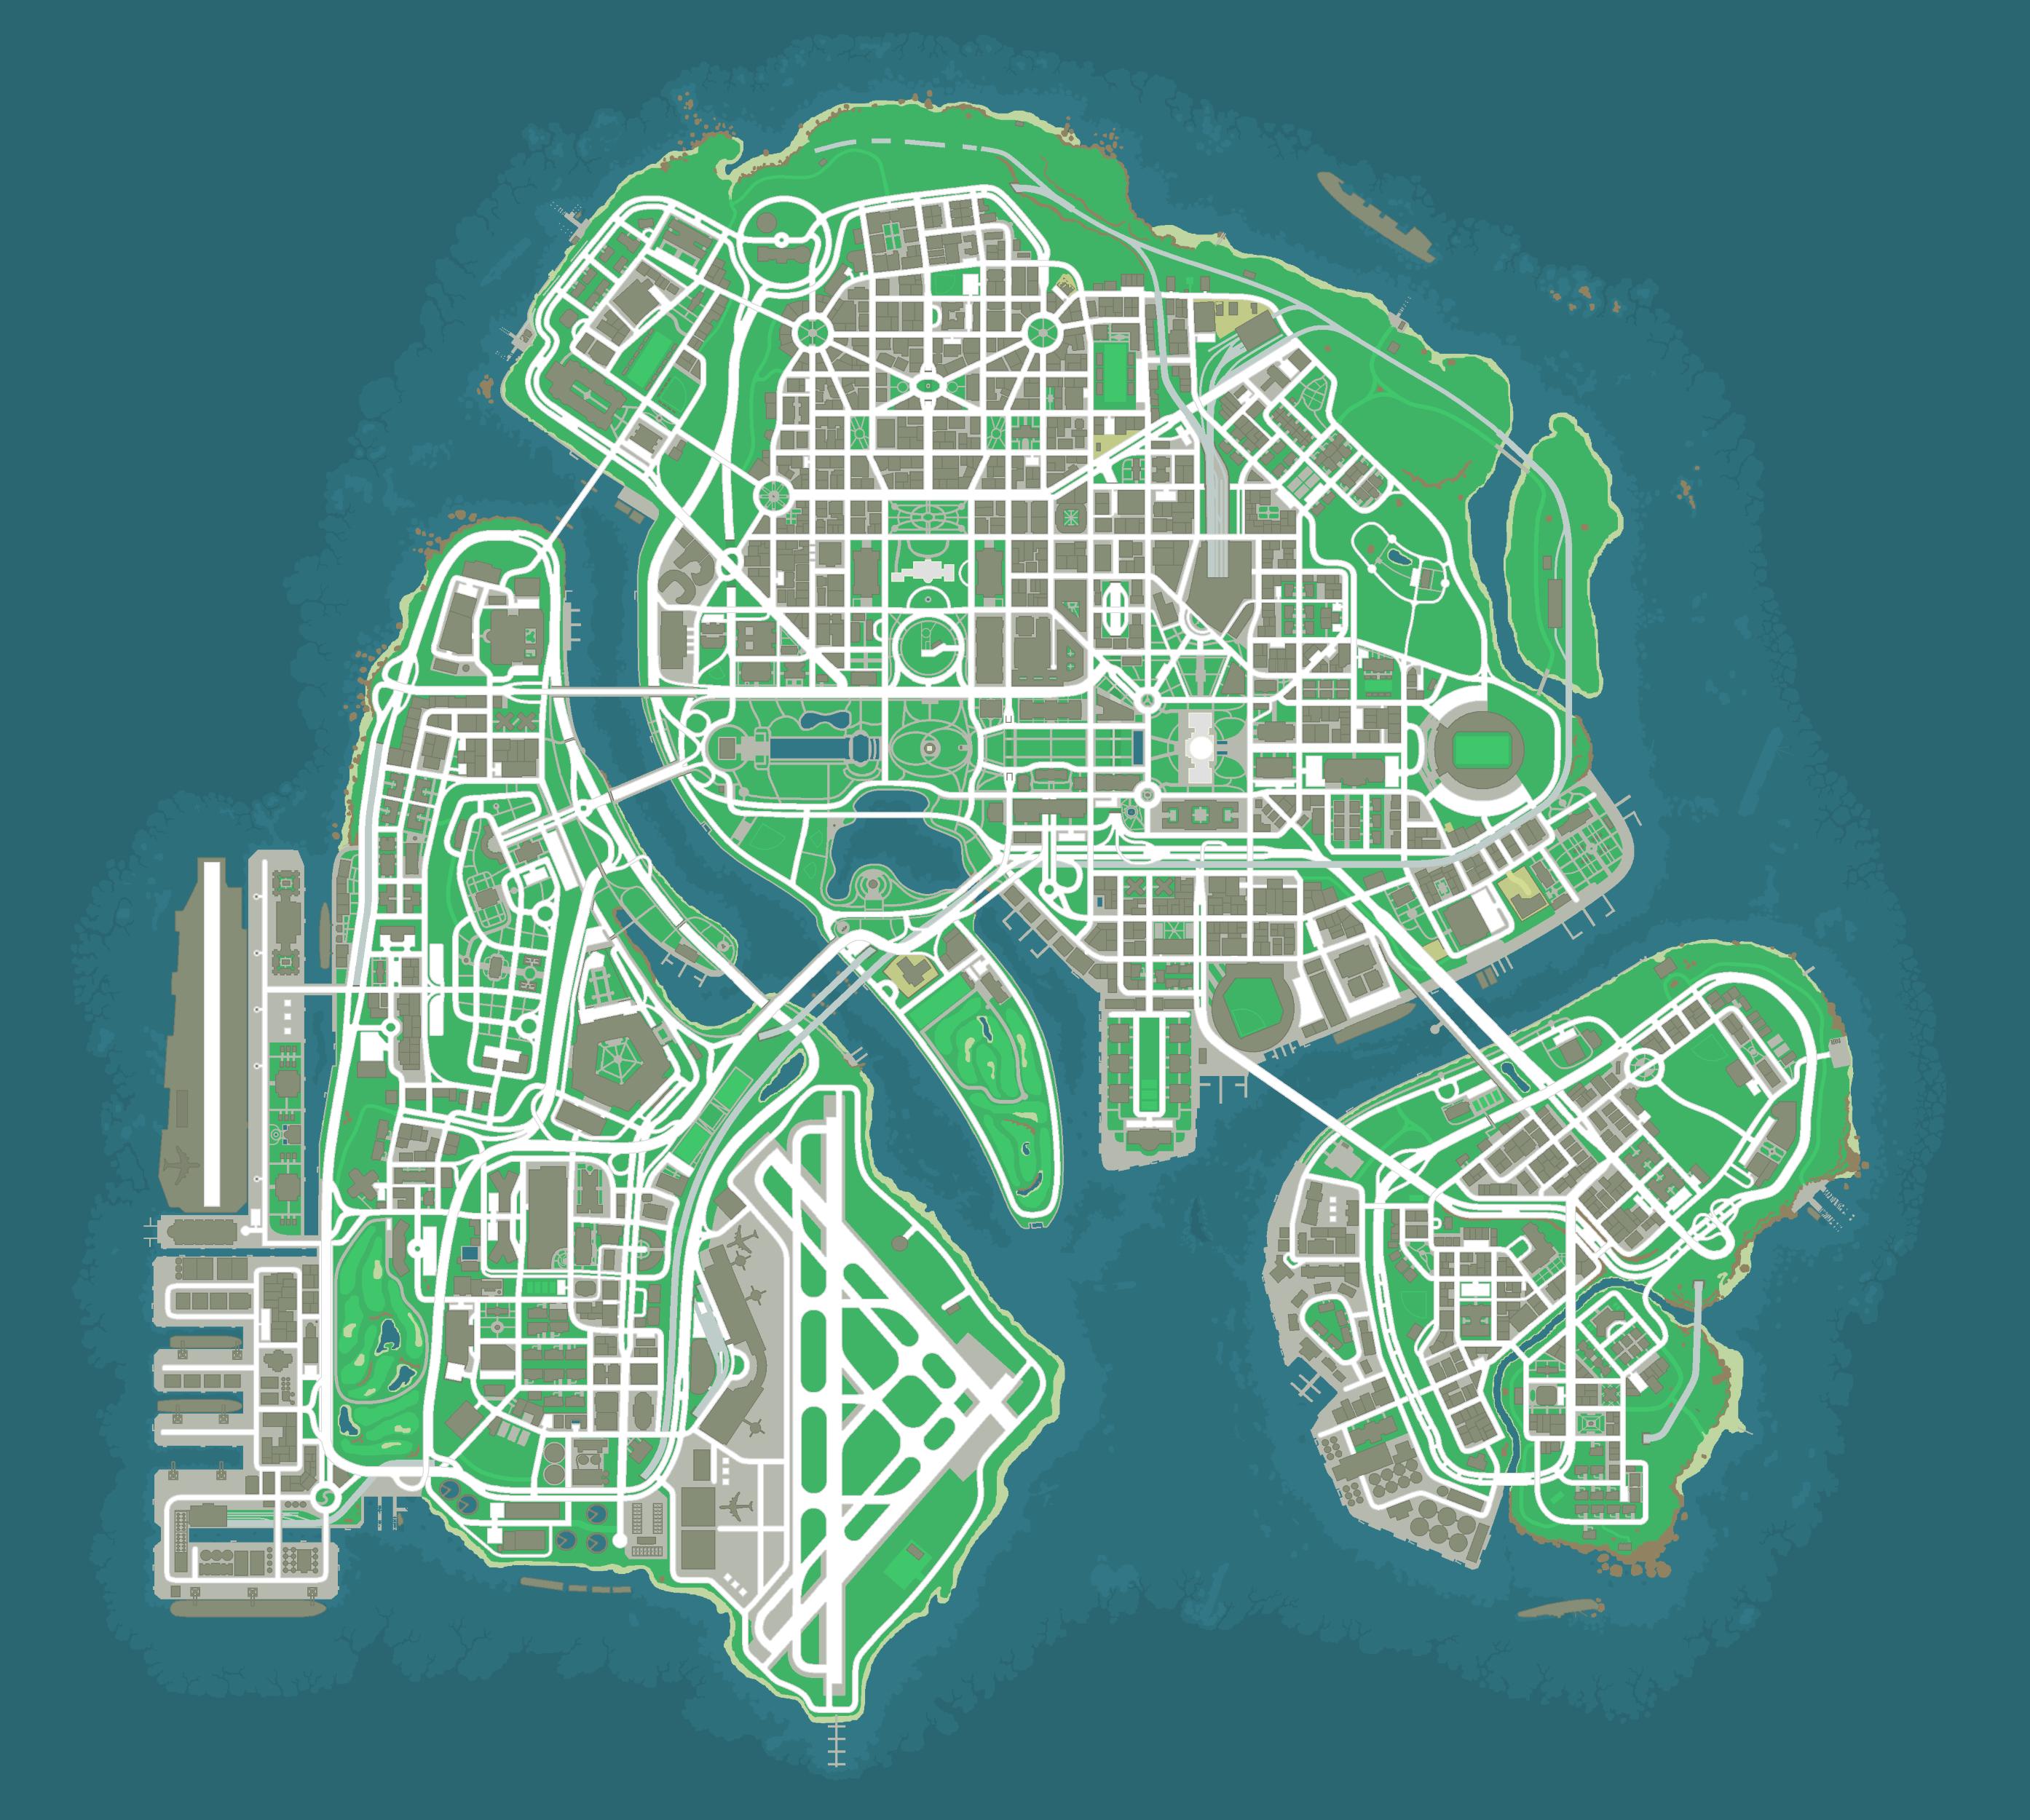 GTA Capital City Map by Maniac-Deadite on DeviantArt